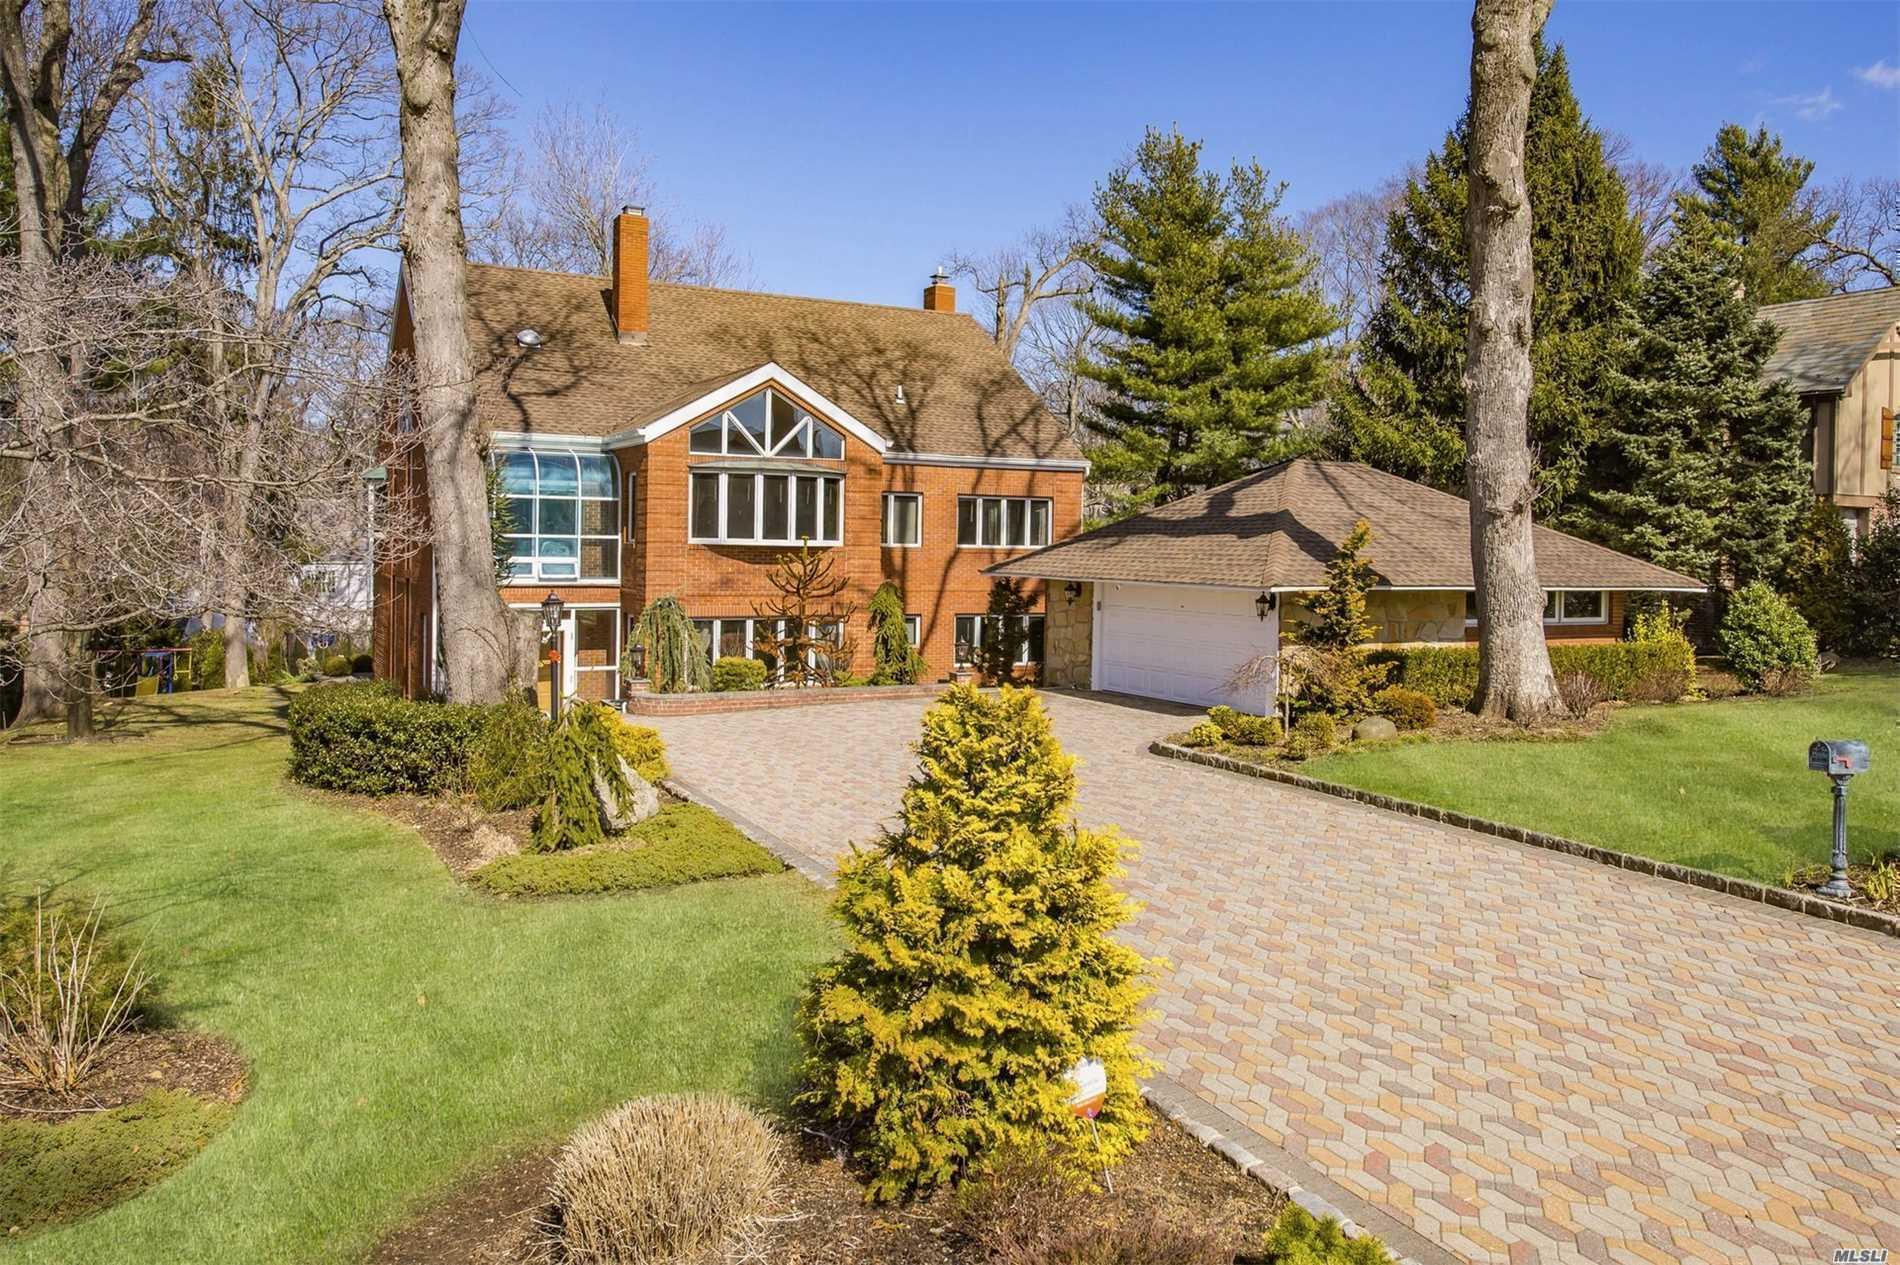 Photo of home for sale at 184 Aldershot Ln, Manhasset NY